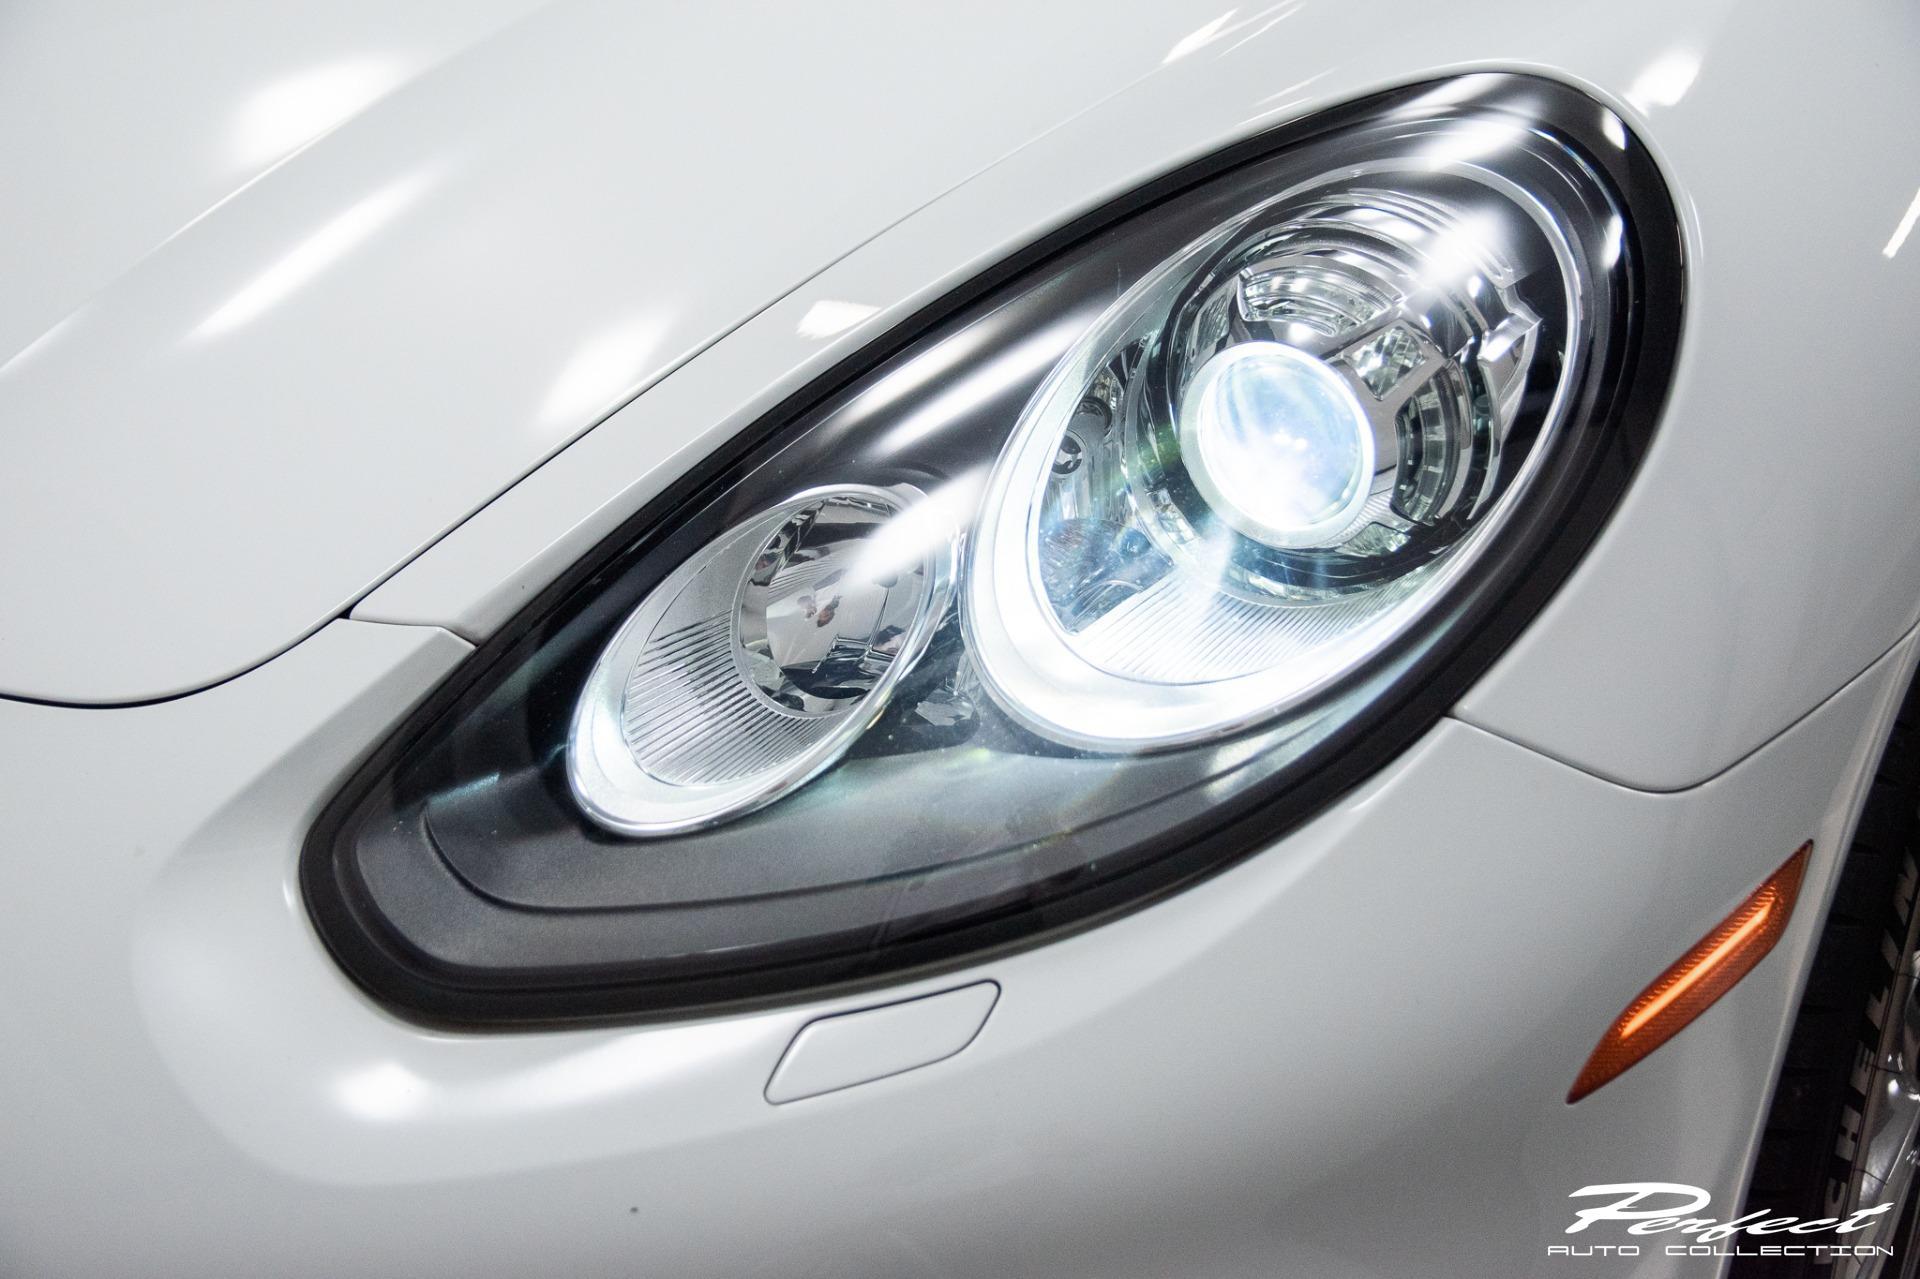 Used 2014 Porsche Panamera Turbo